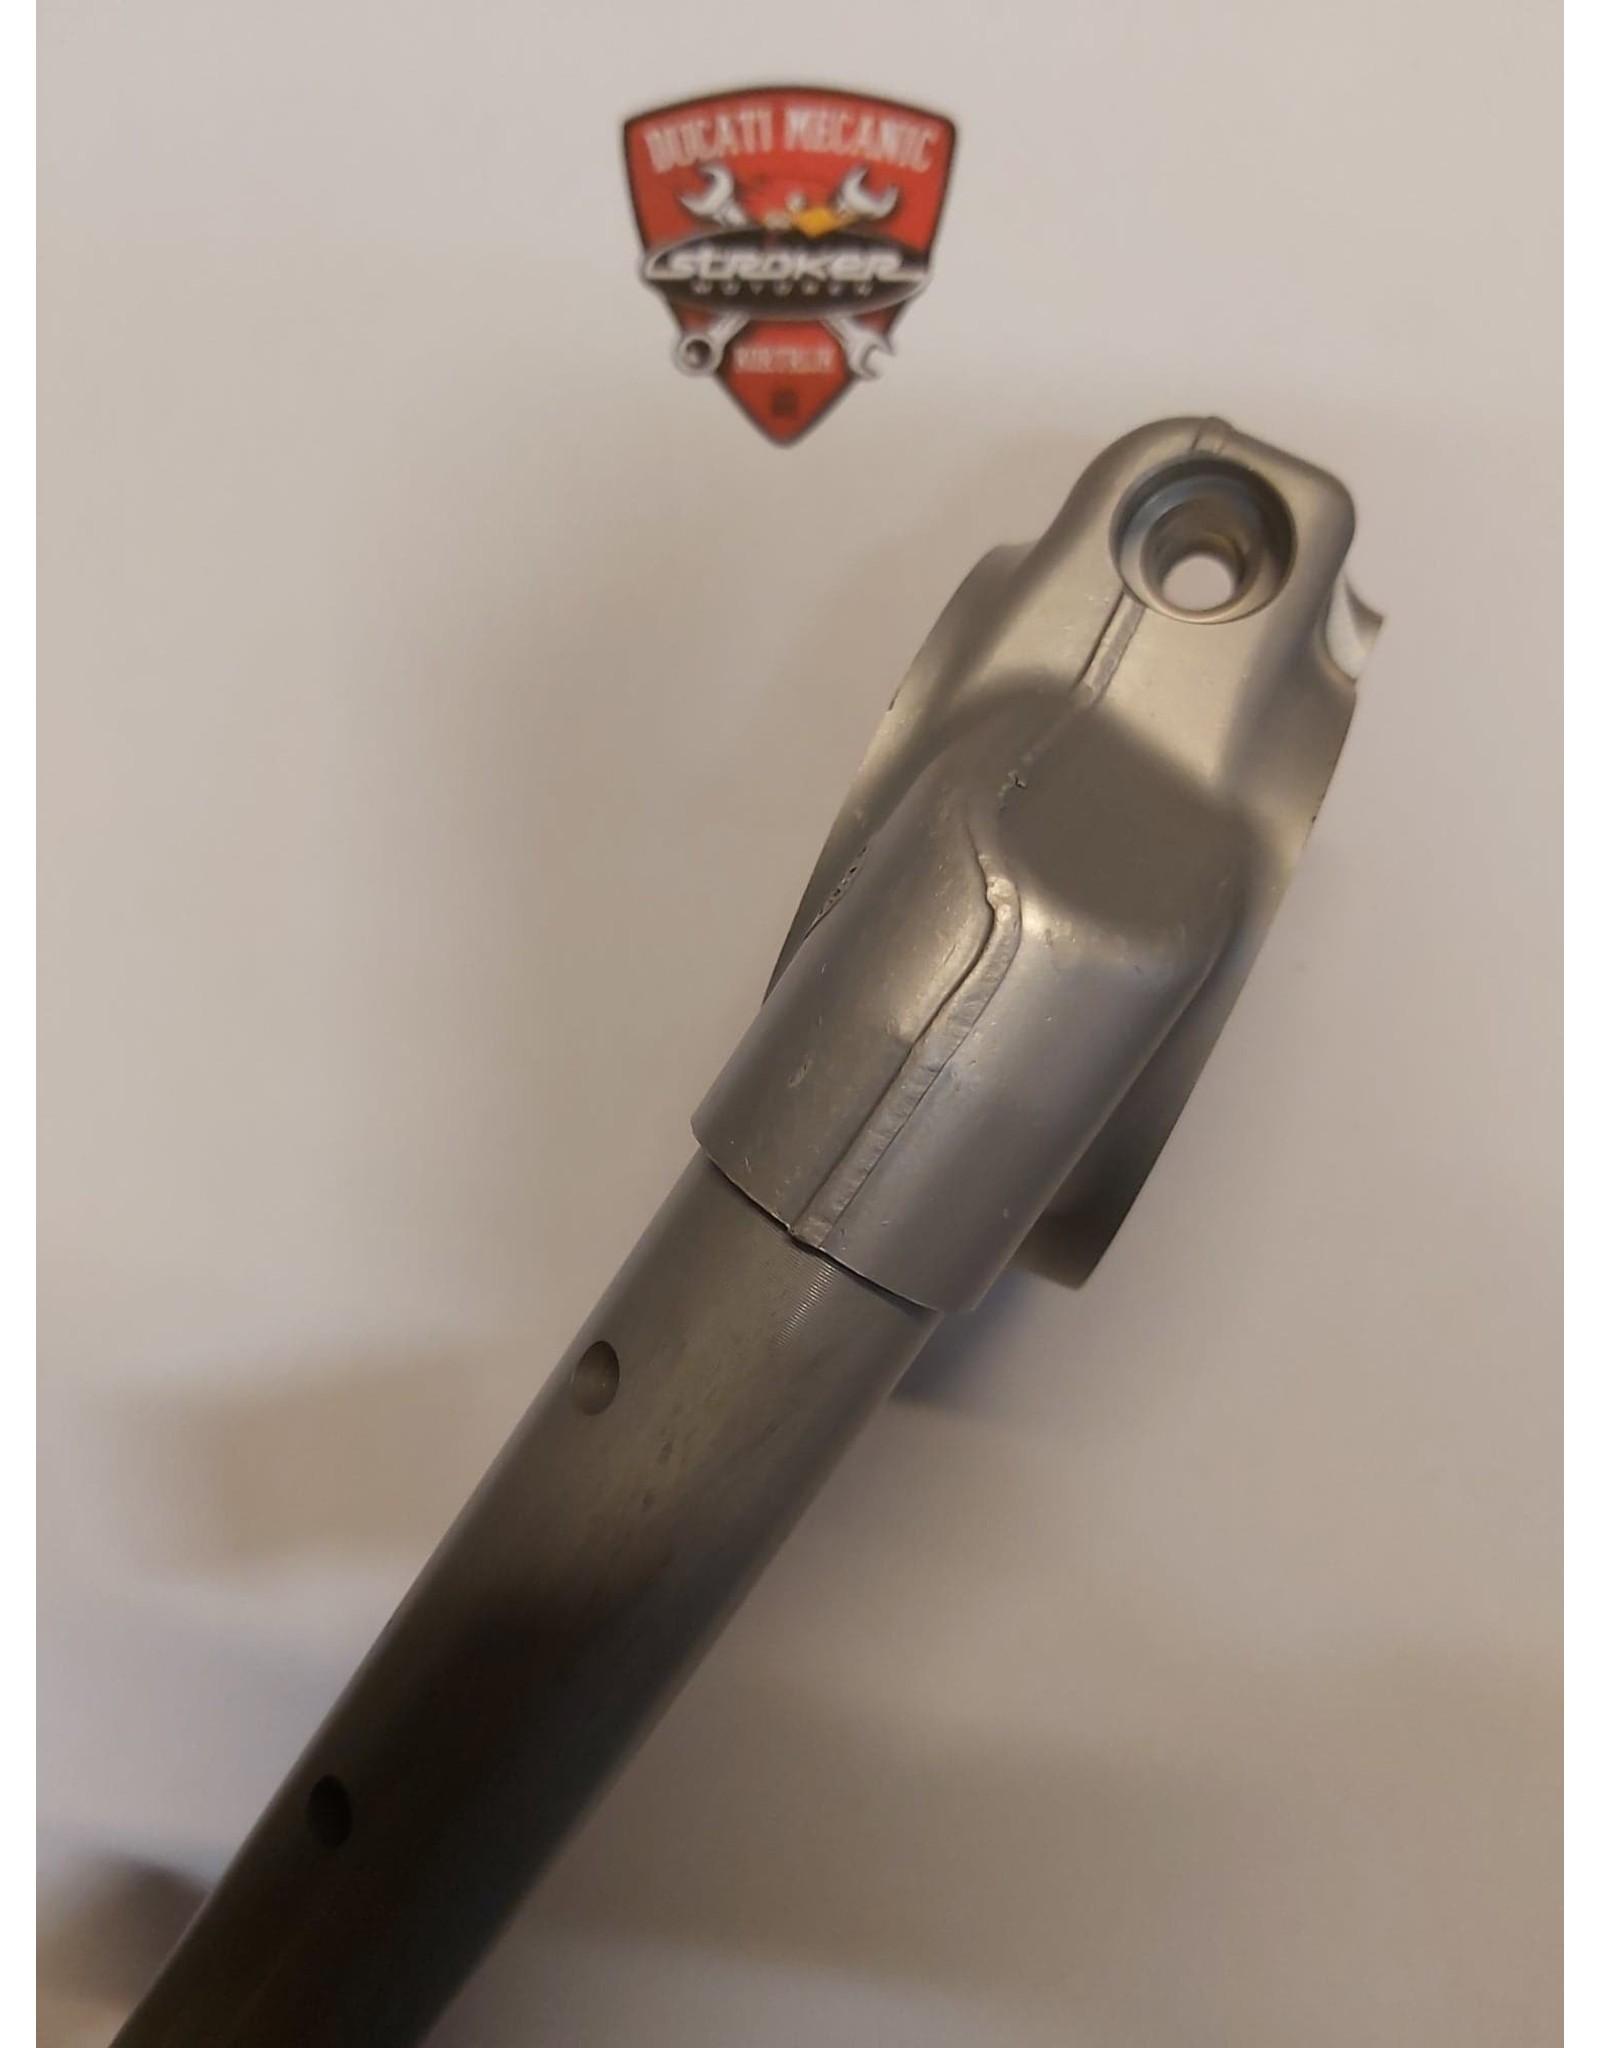 Ducati Ducati 749s 749 999 Left Side Clipon Handle Bar Handlebar 36010441A